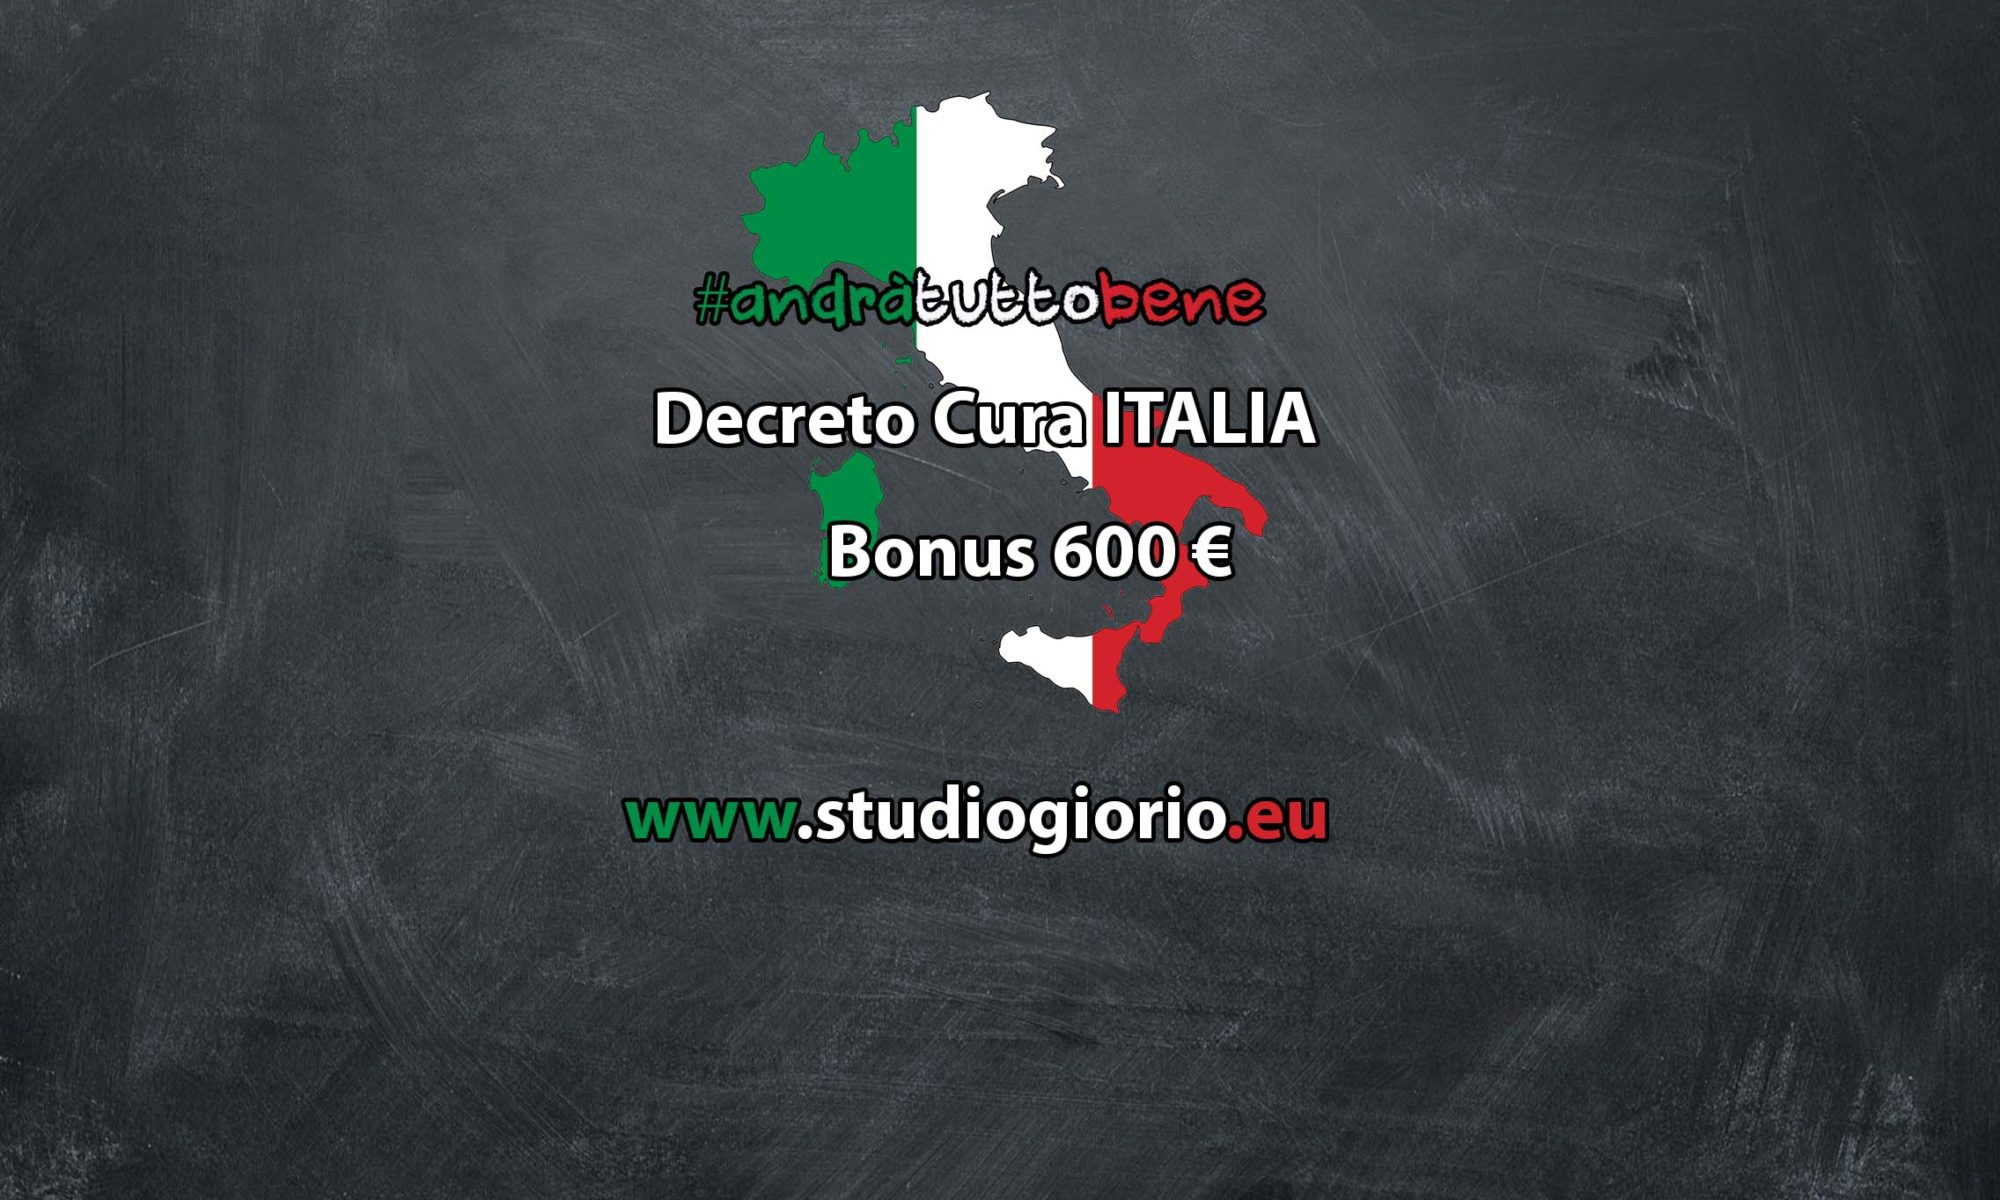 INPS bonus 600 euro Decreto Cura Italia